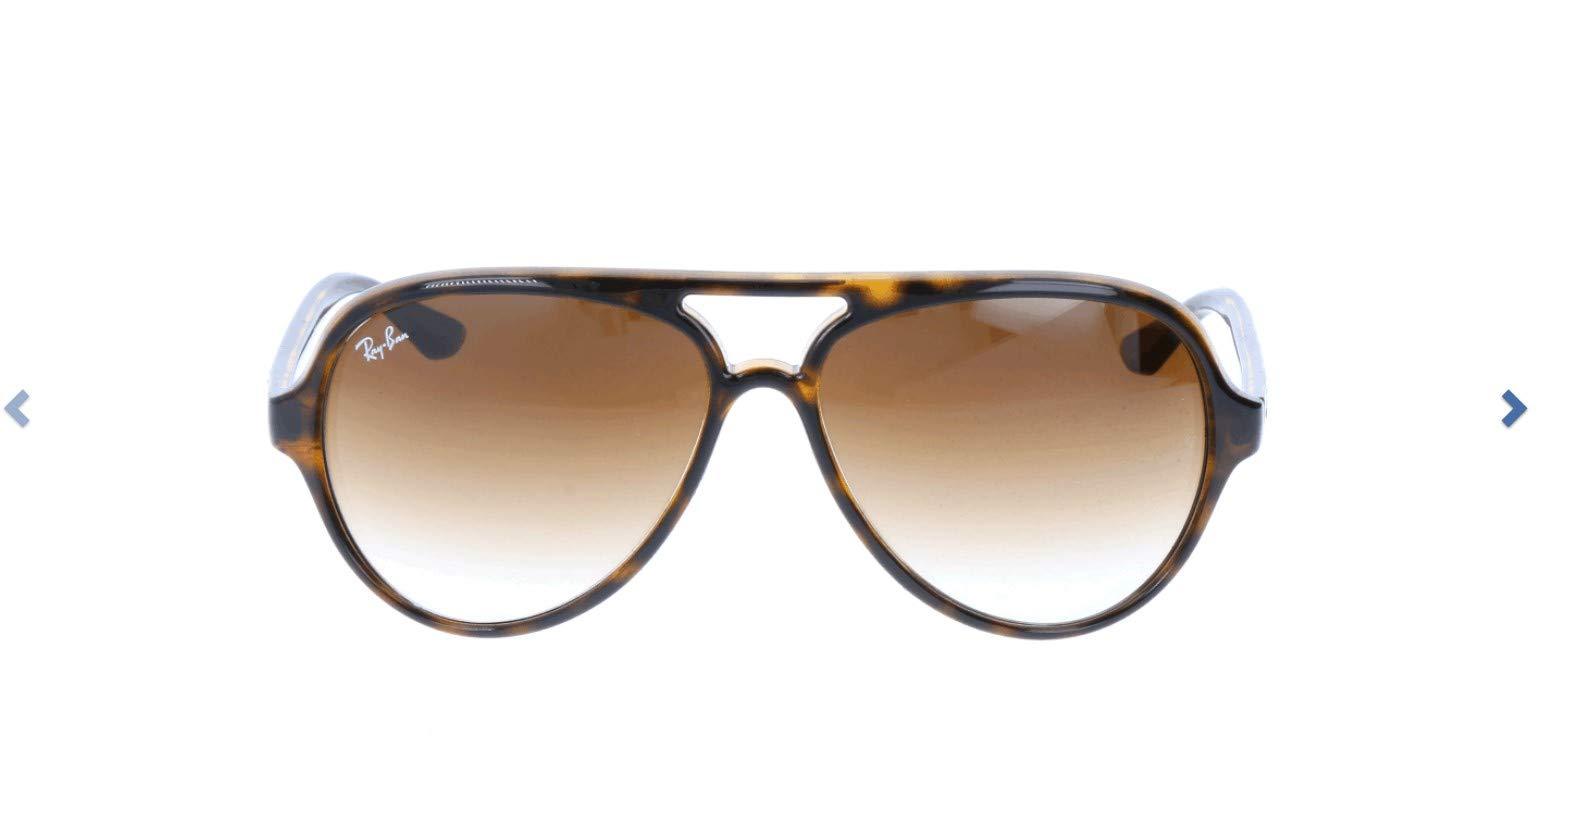 Ray-Ban RB4125 Cats 5000 Aviator Sunglasses, Light Tortoise/Brown Gradient, 59 mm